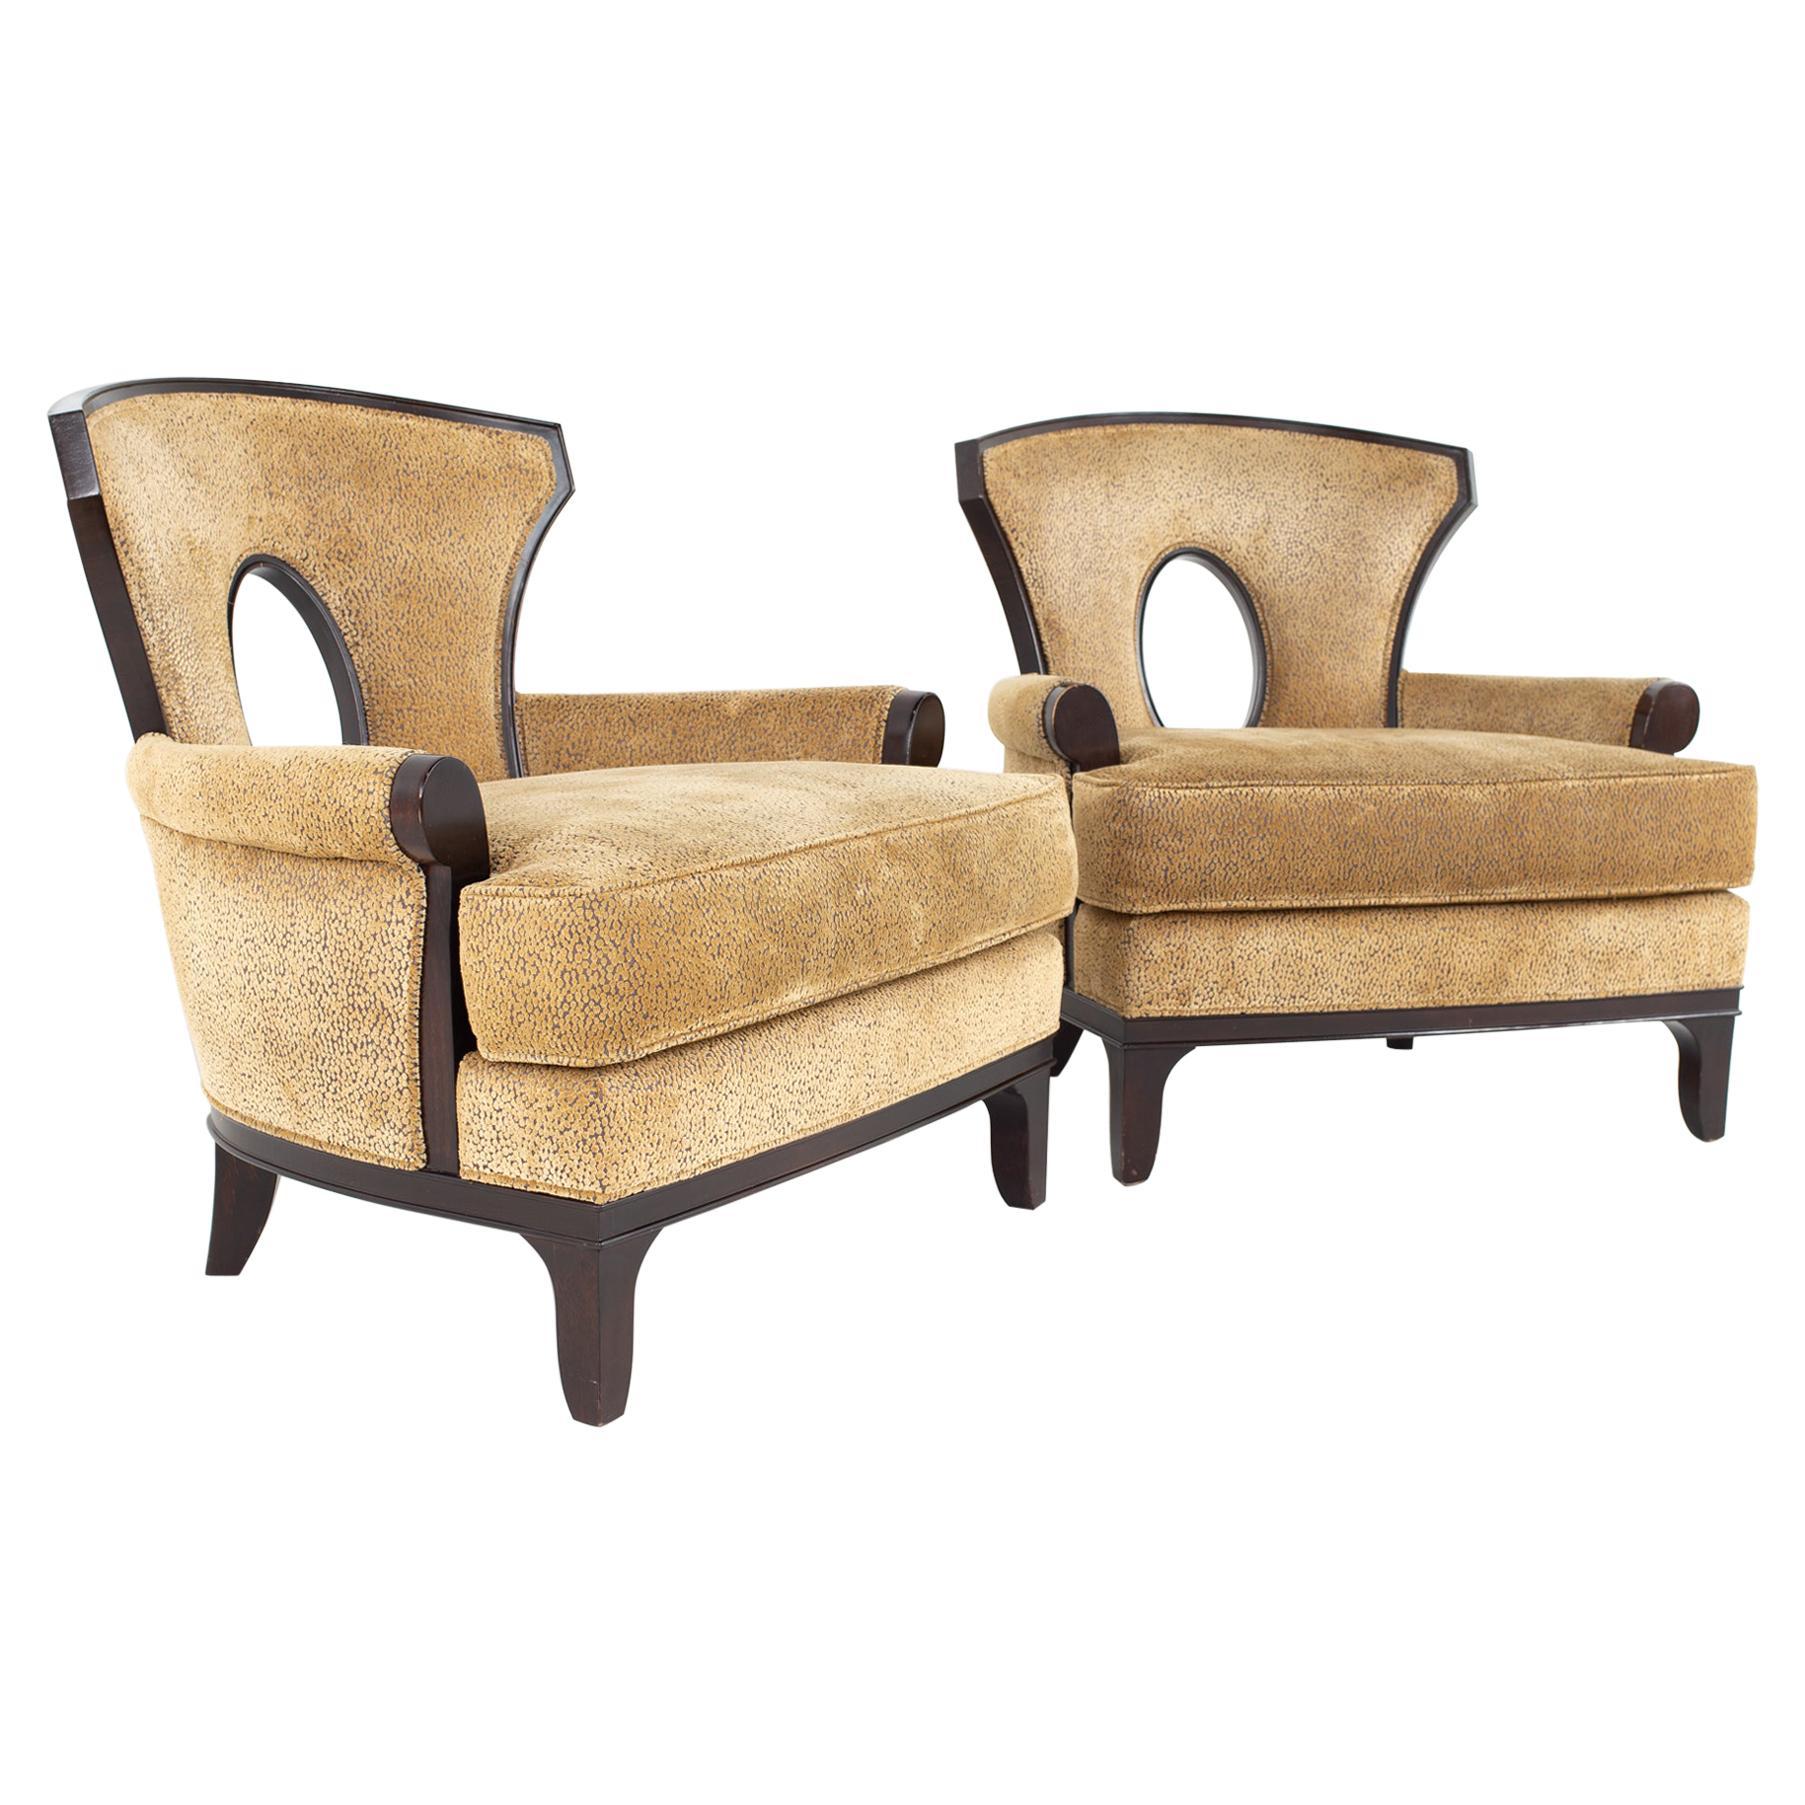 Barbara Barry for Henredon Modern Lounge Chair, a Pair